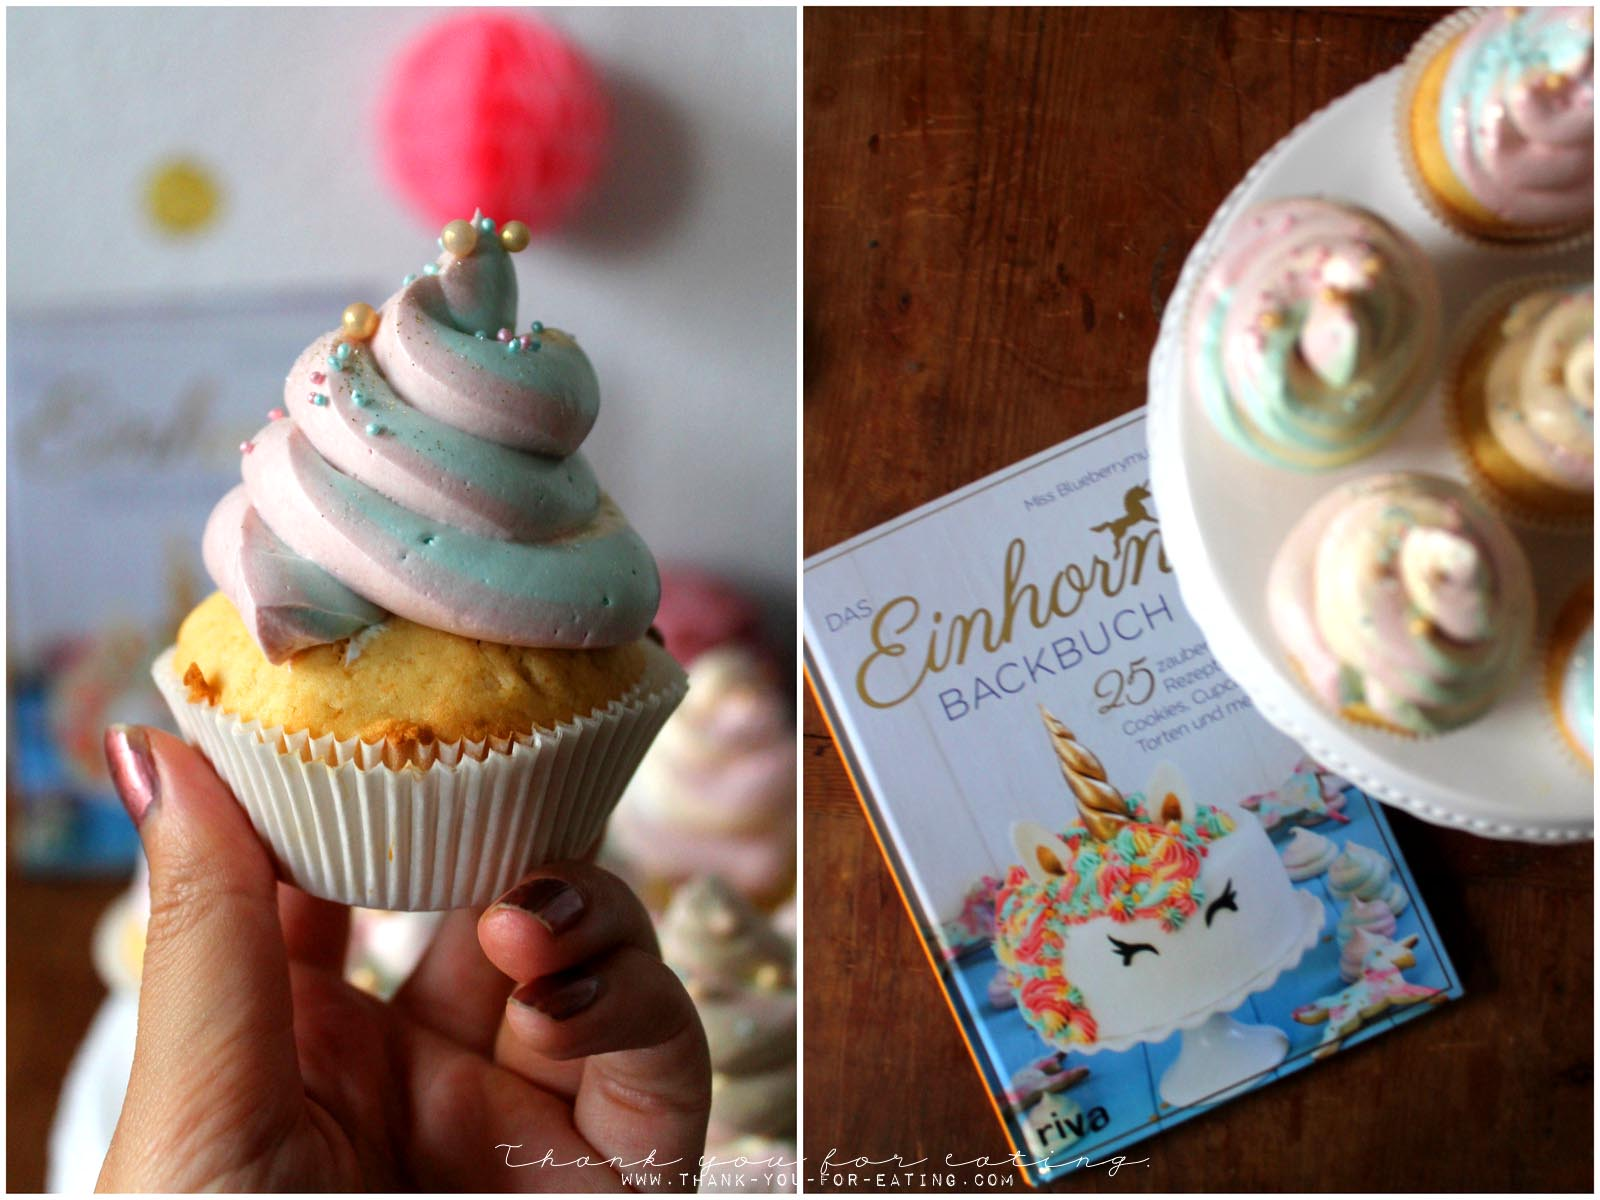 Rezept für Unicorn-Poop-Cupcakes